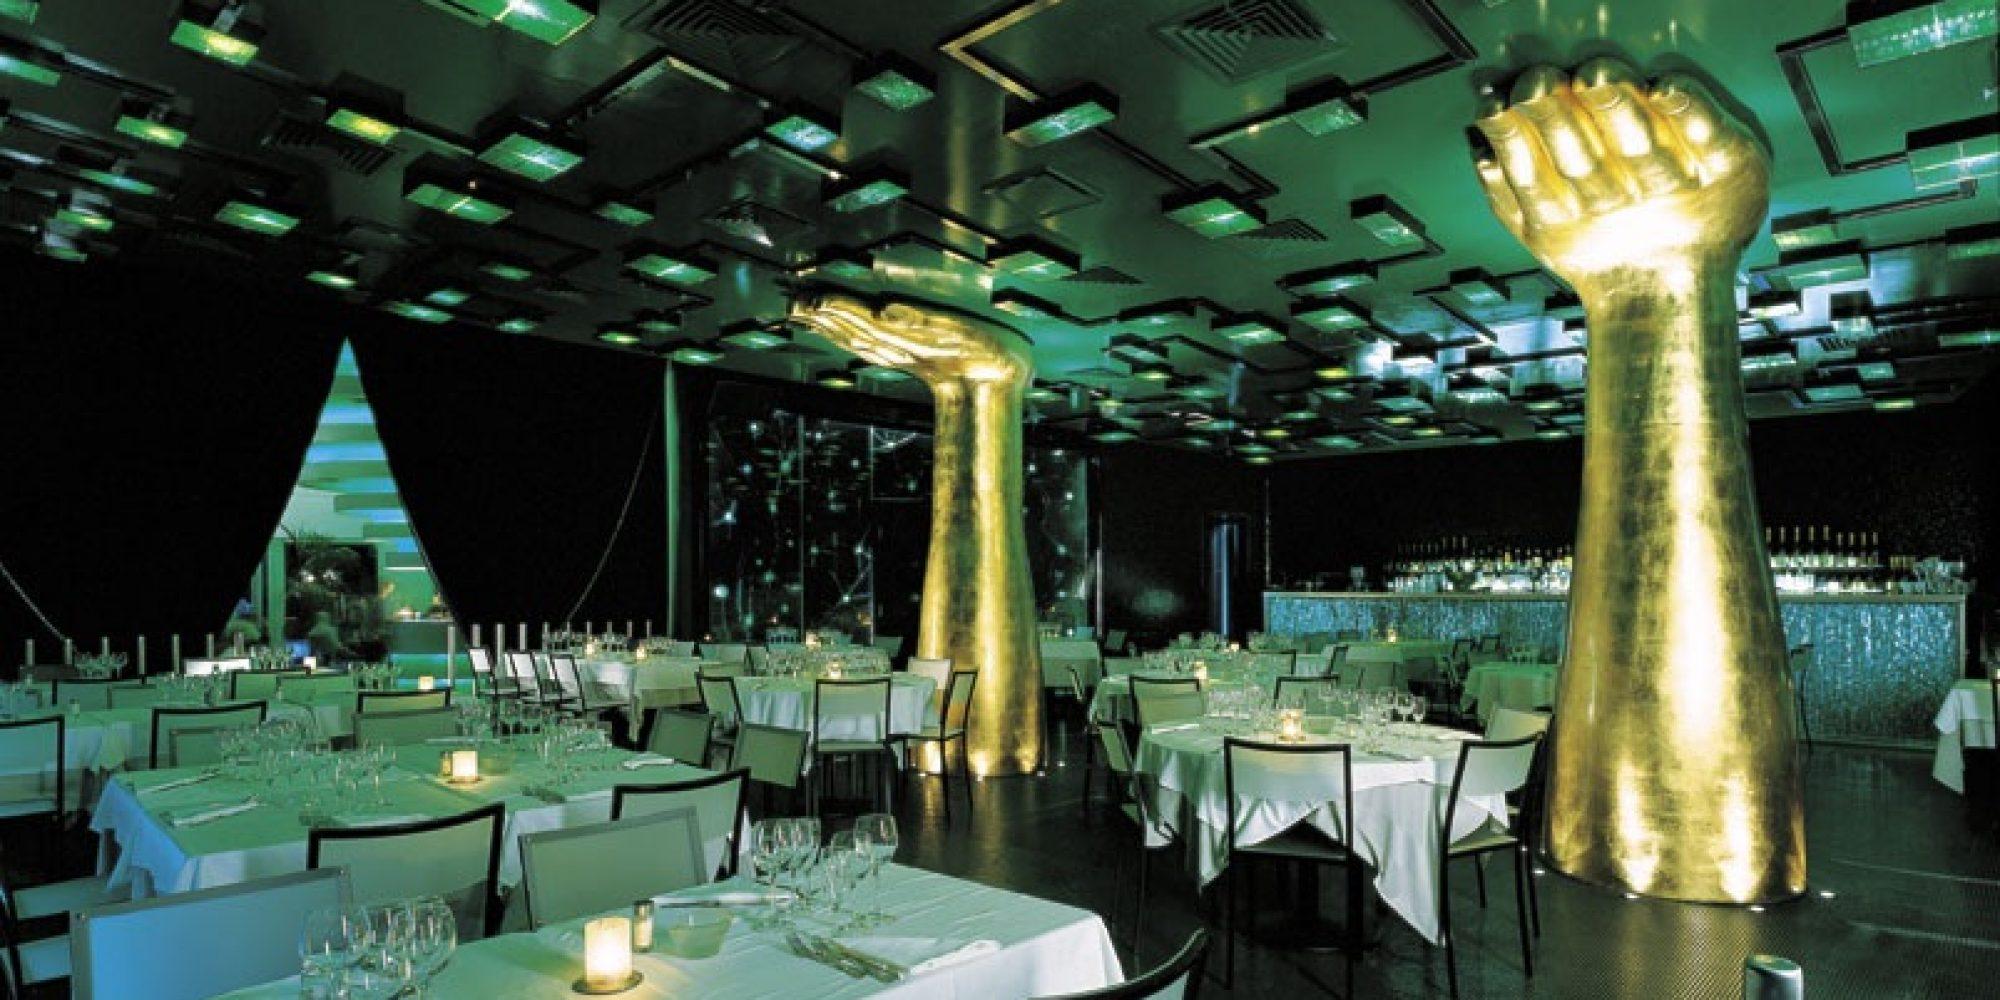 04_Shu_restaurant_cafè_Milano_1999